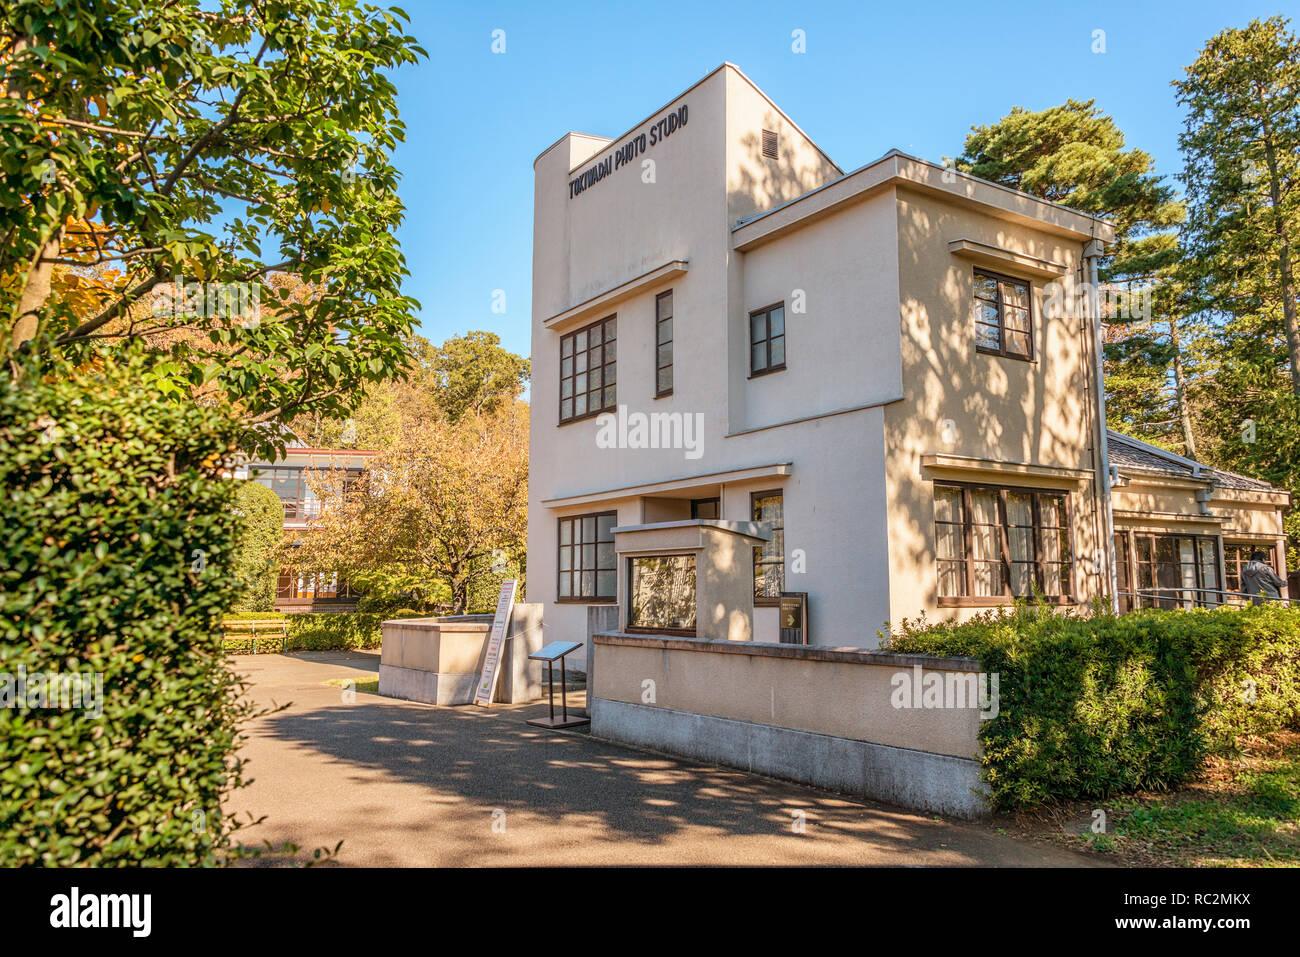 Tokiwadai Photo Studio, Edo Tokyo Open Air Architectural Museum, Japan,  build in 1937 | Das 1937 gebaute Tokiwadai Photo Studio im Edo Tokyo Open Air - Stock Image